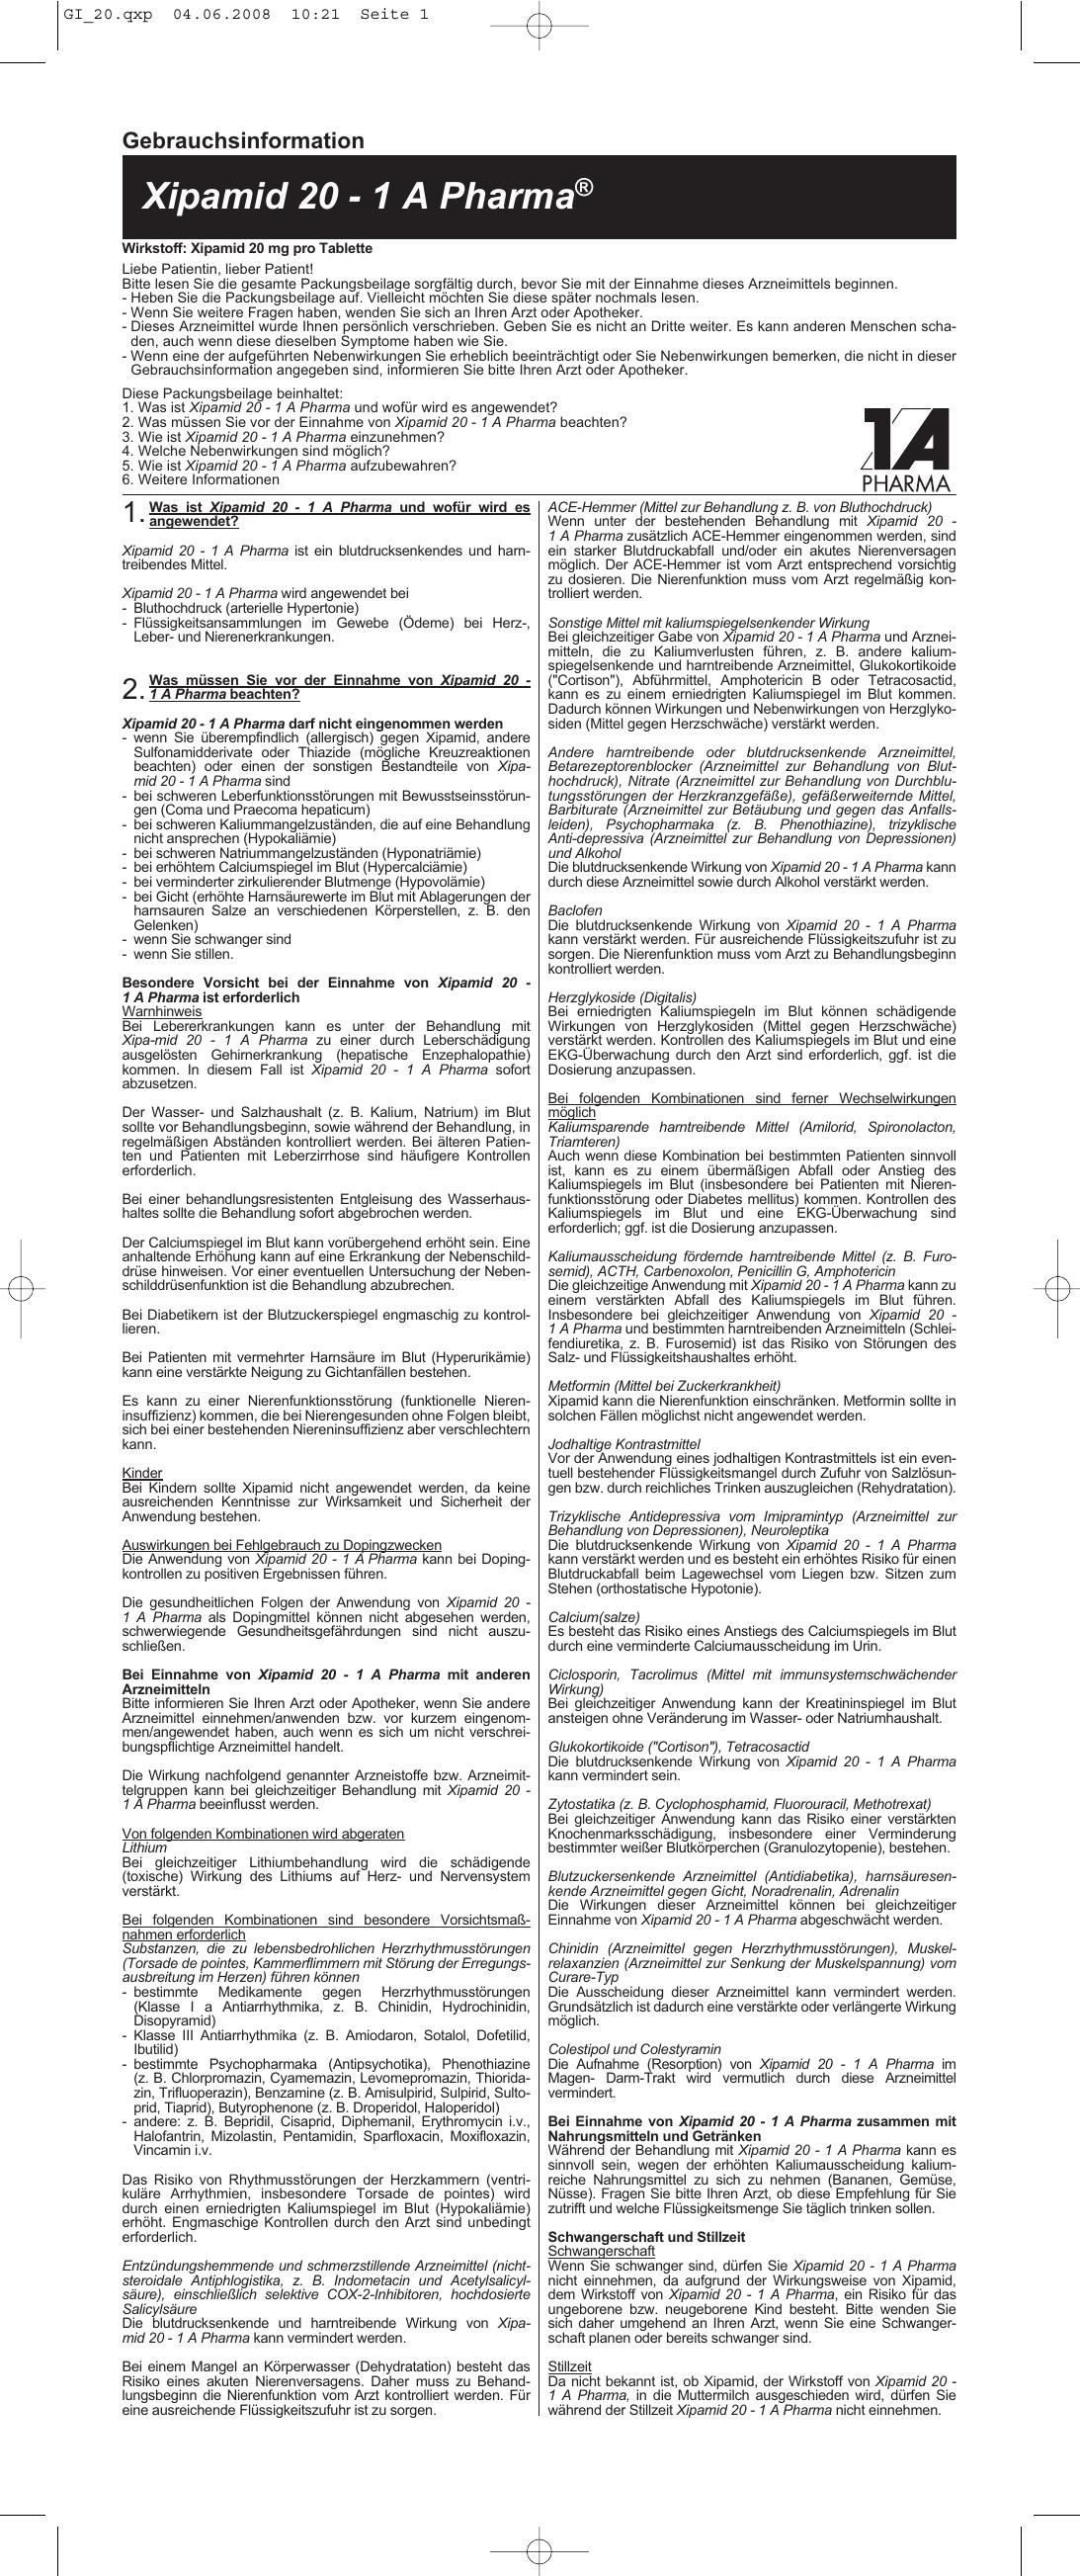 Xipamid 20 - 1 A Pharma - medikamente-per